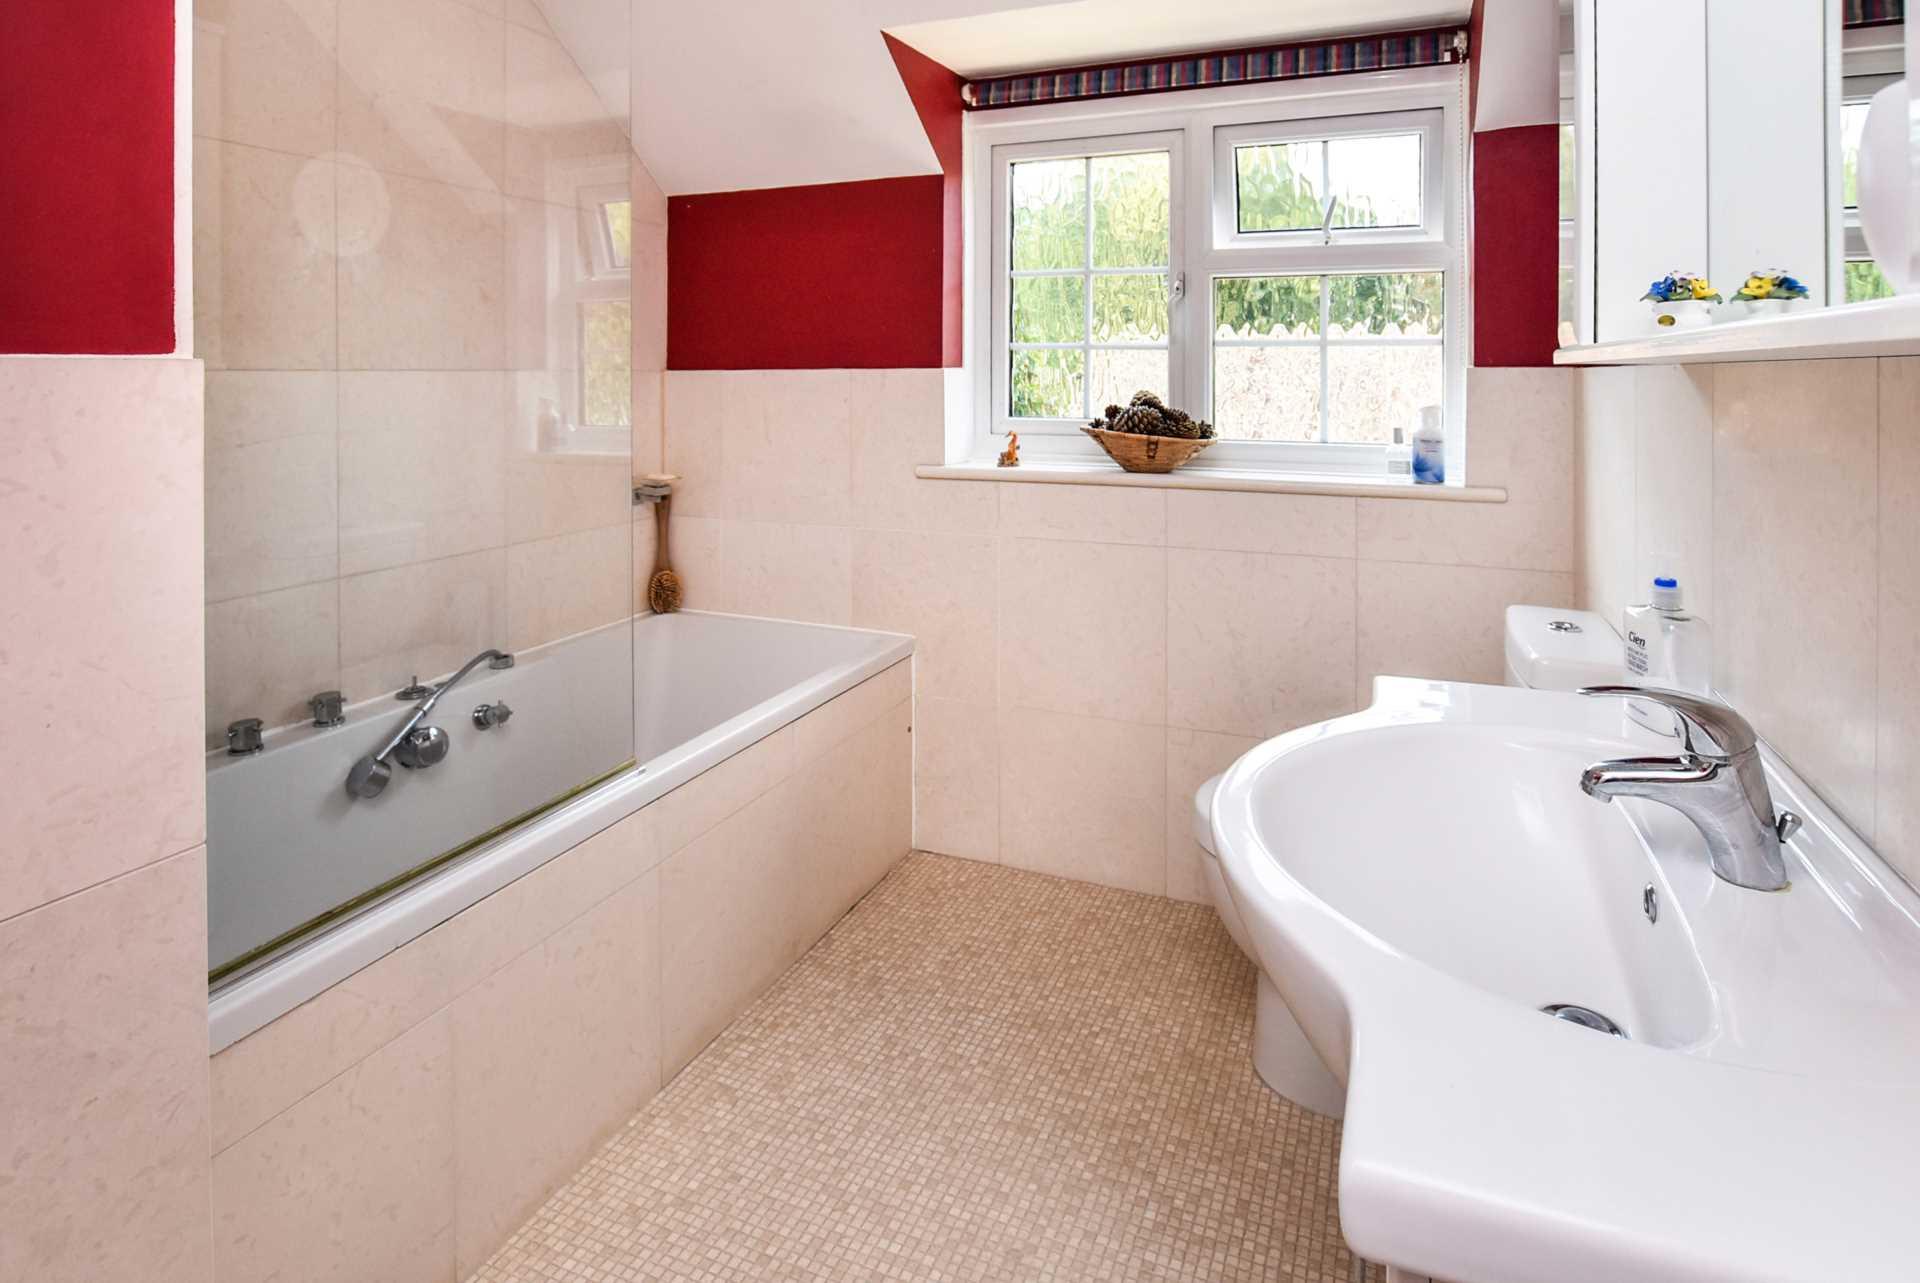 Fullamoor Cottages, Clifton Hampden, Image 9